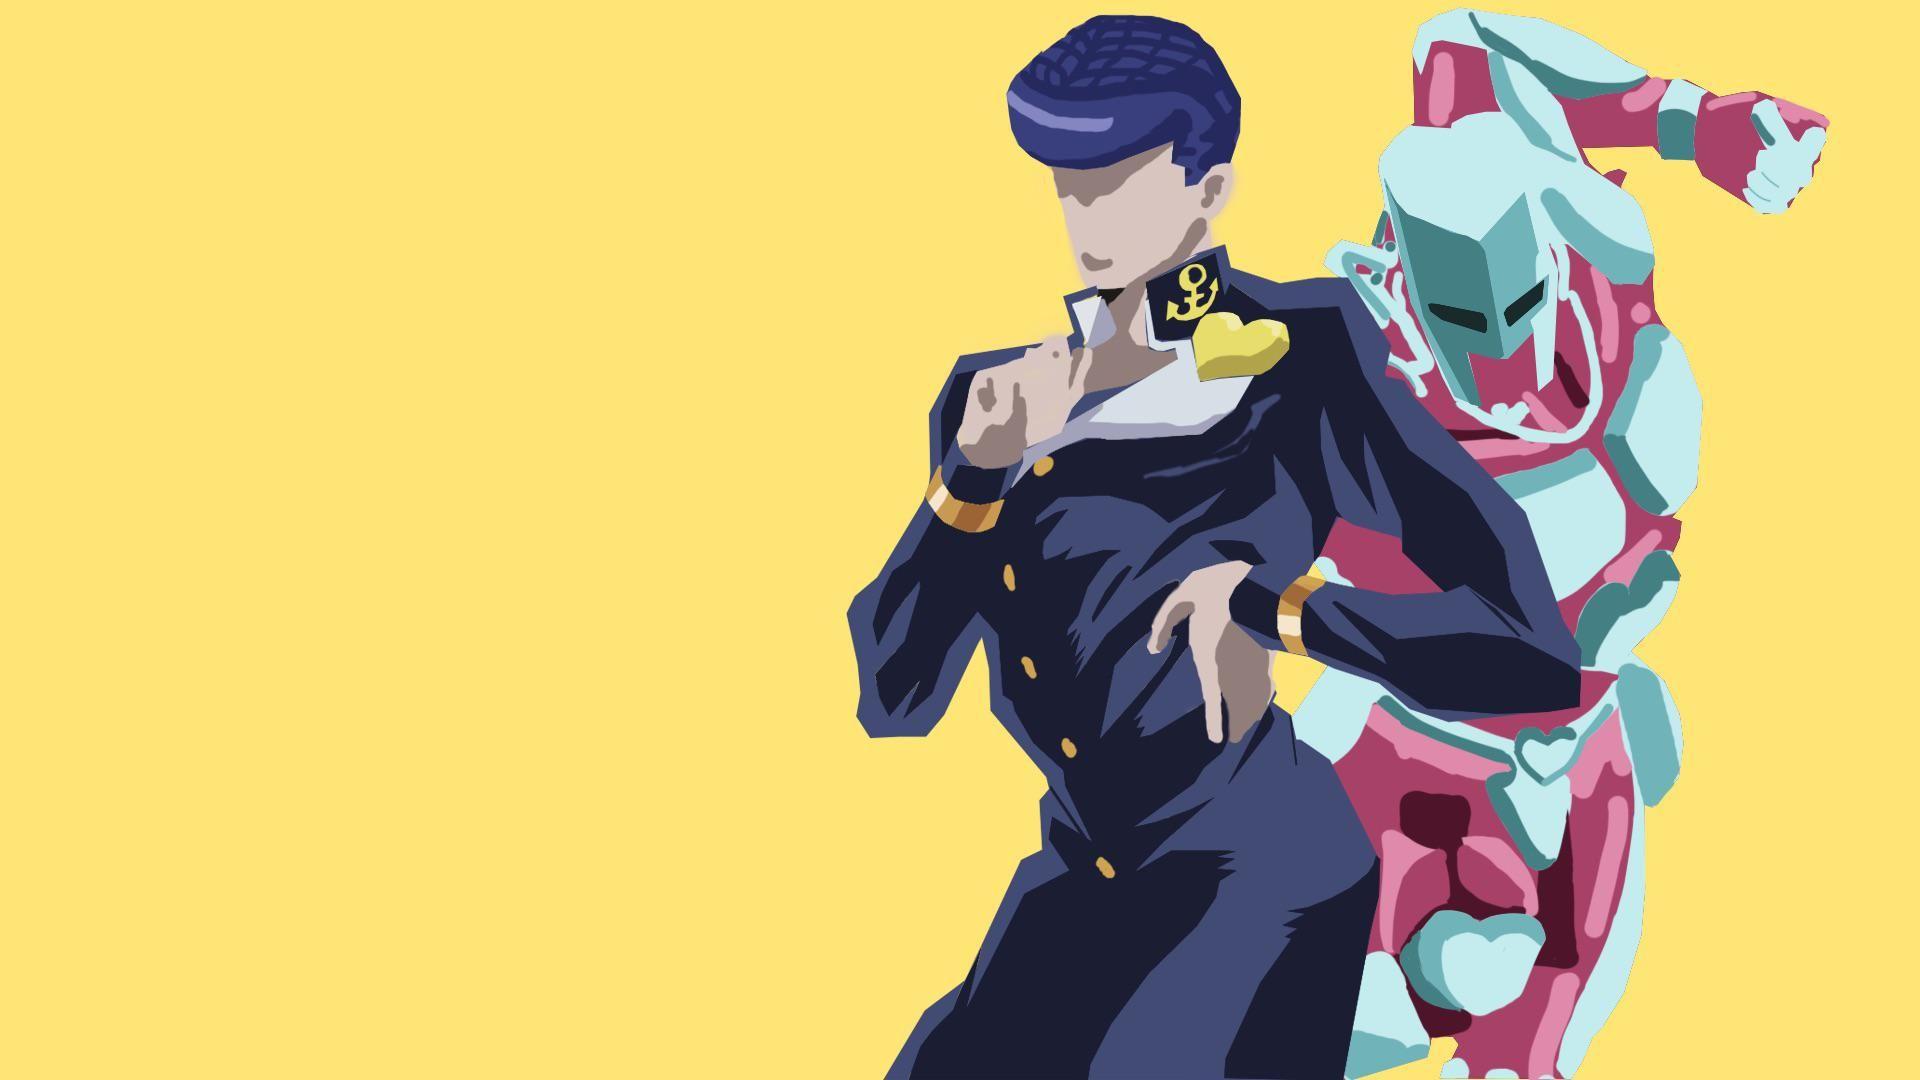 Josuke Higashikata 1920x1080 Cute Anime Chibi Cartoon Art Styles Jojo S Bizarre Adventure